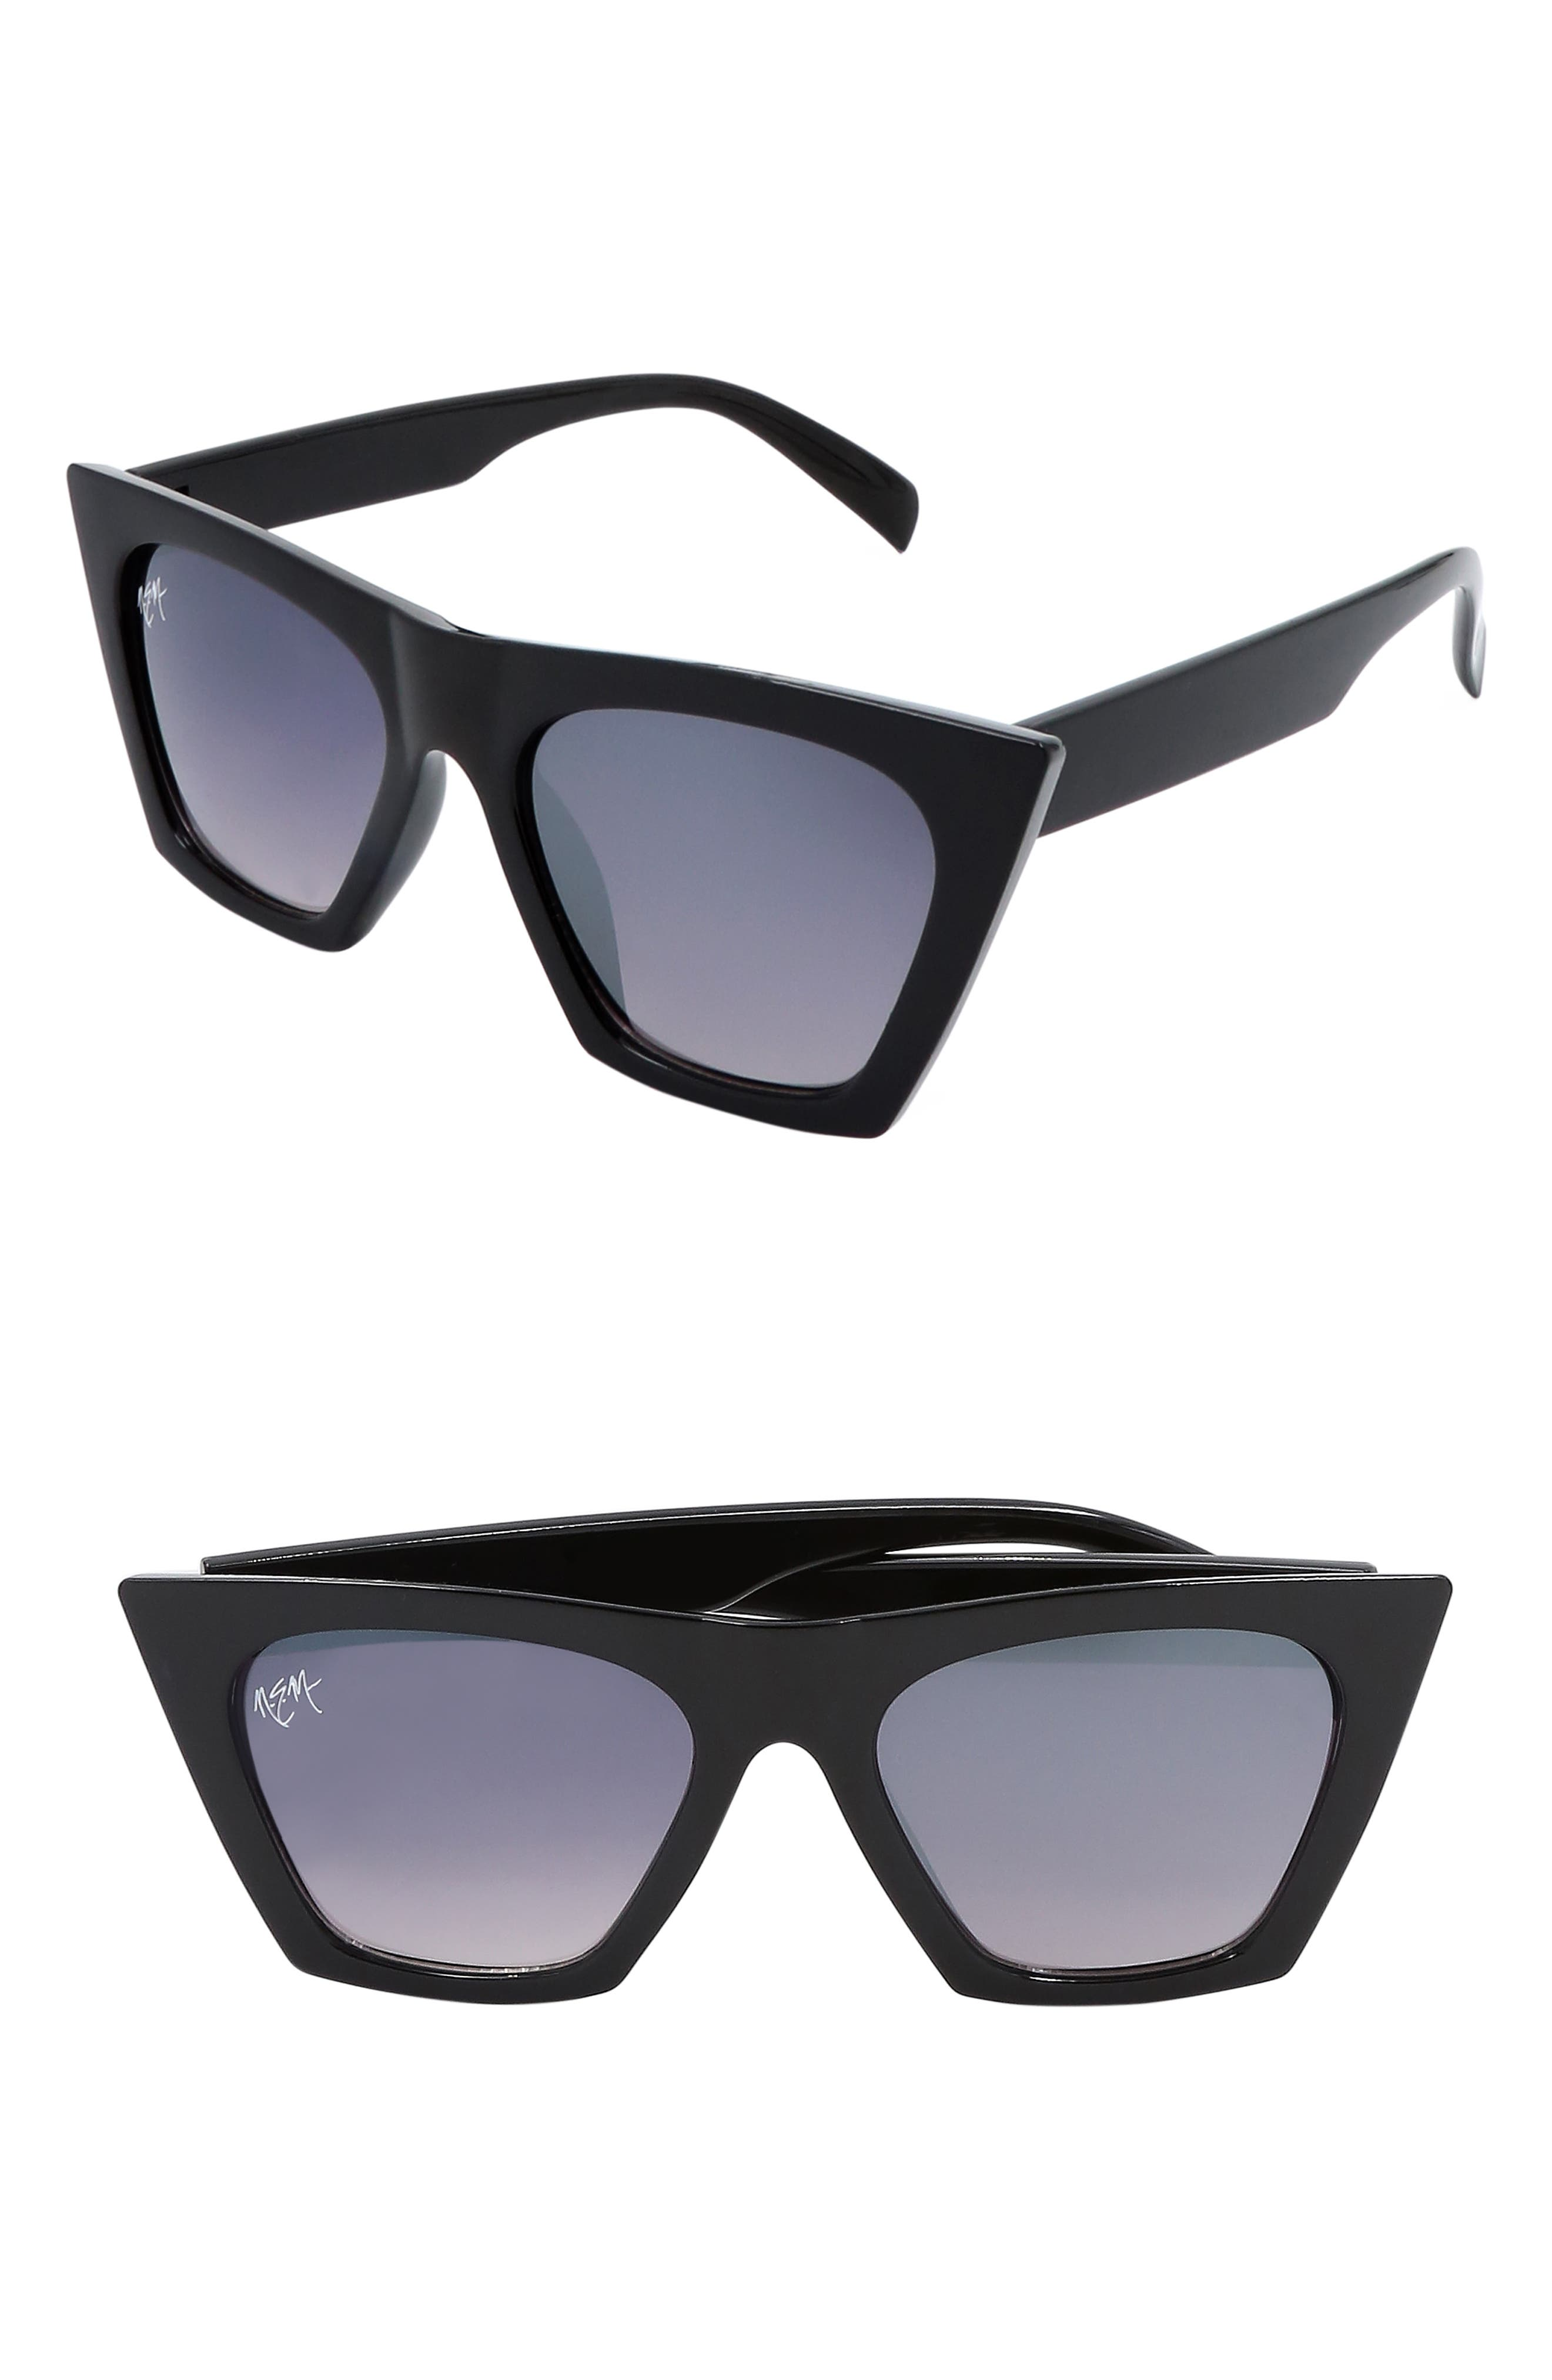 Posh 50mm Gradient Angular Sunglasses,                         Main,                         color, BLACK W GREY GRADIENT LENS